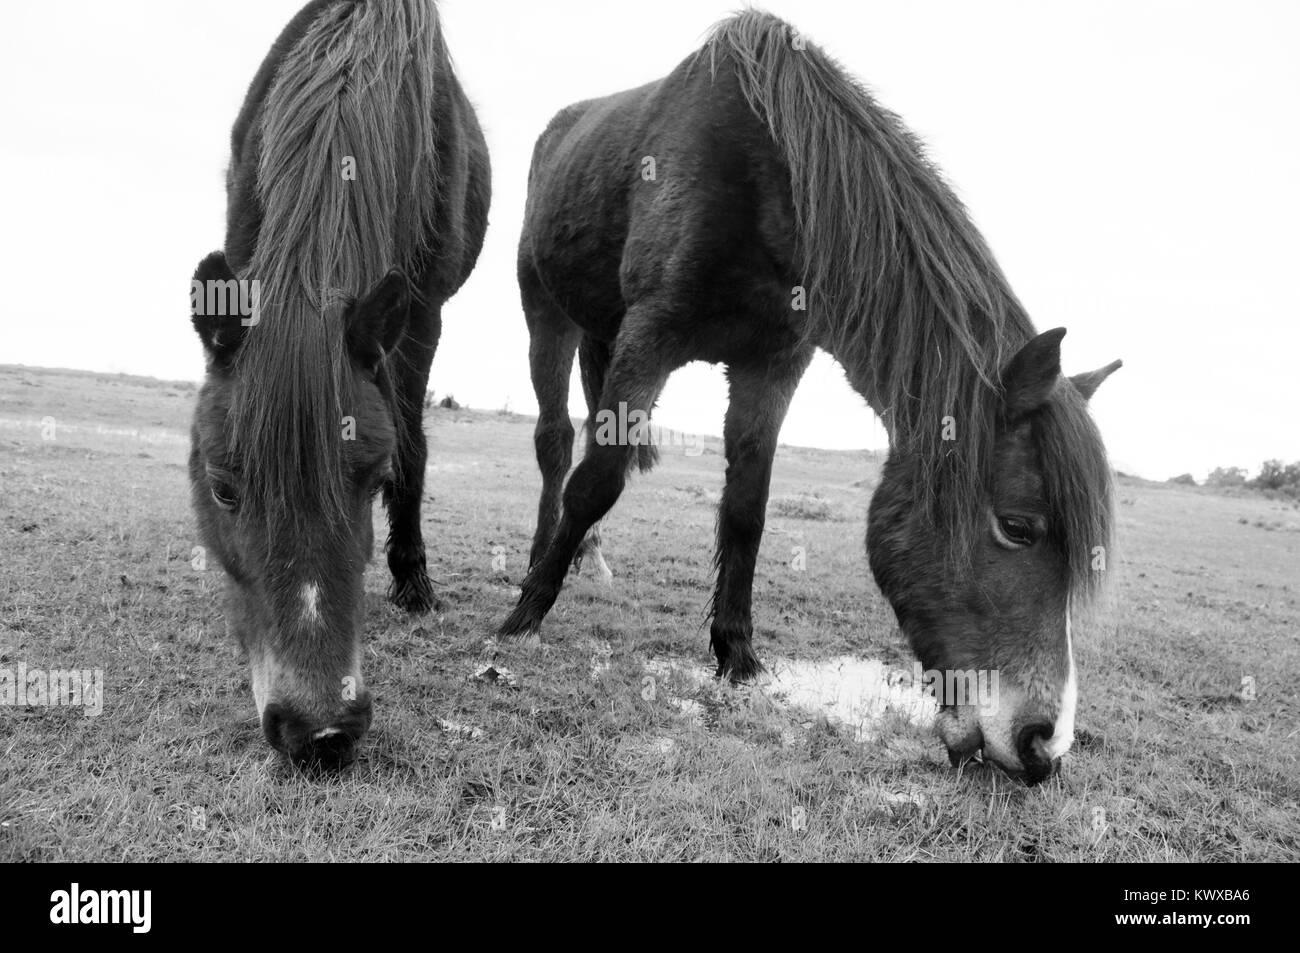 New Forst Ponies Graziing - Stock Image